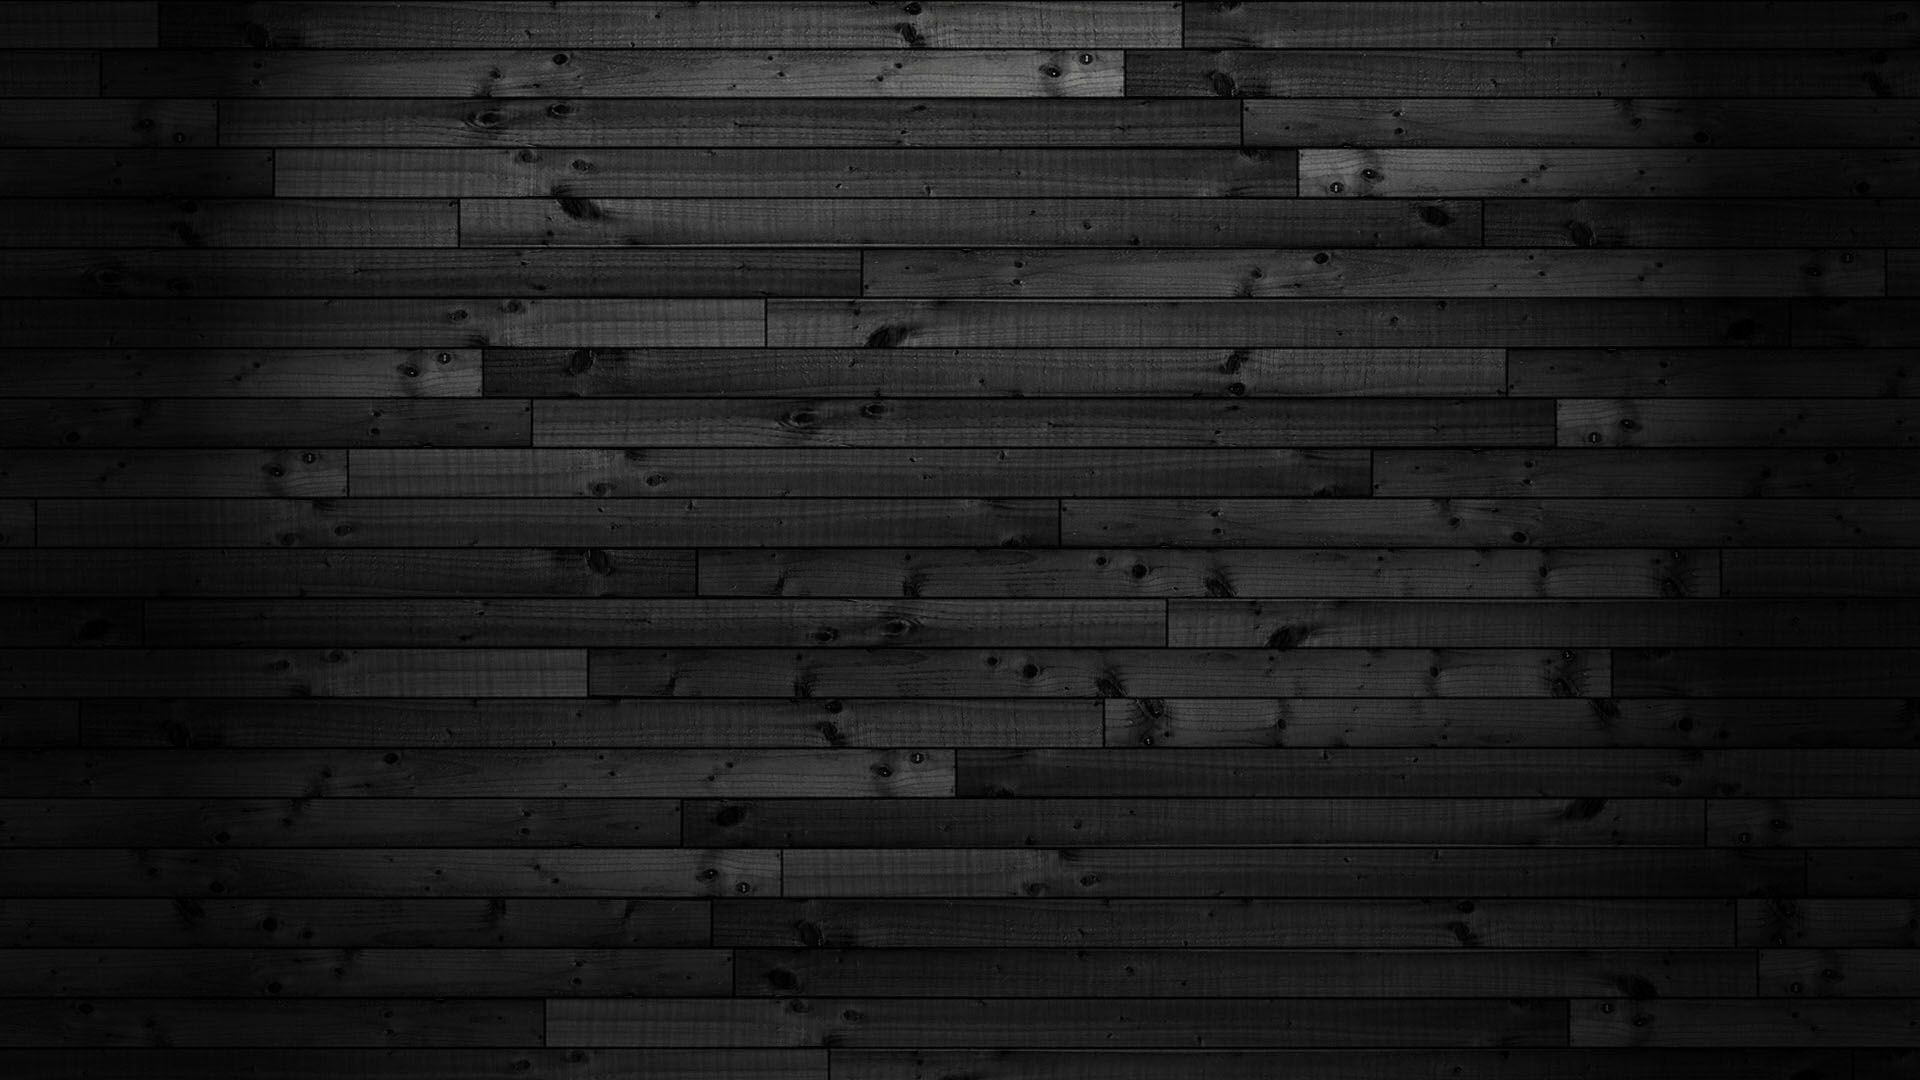 Full Moon Wallpaper High Resolution Uncalke com. Wood Pattern Wallpapers  Group 74